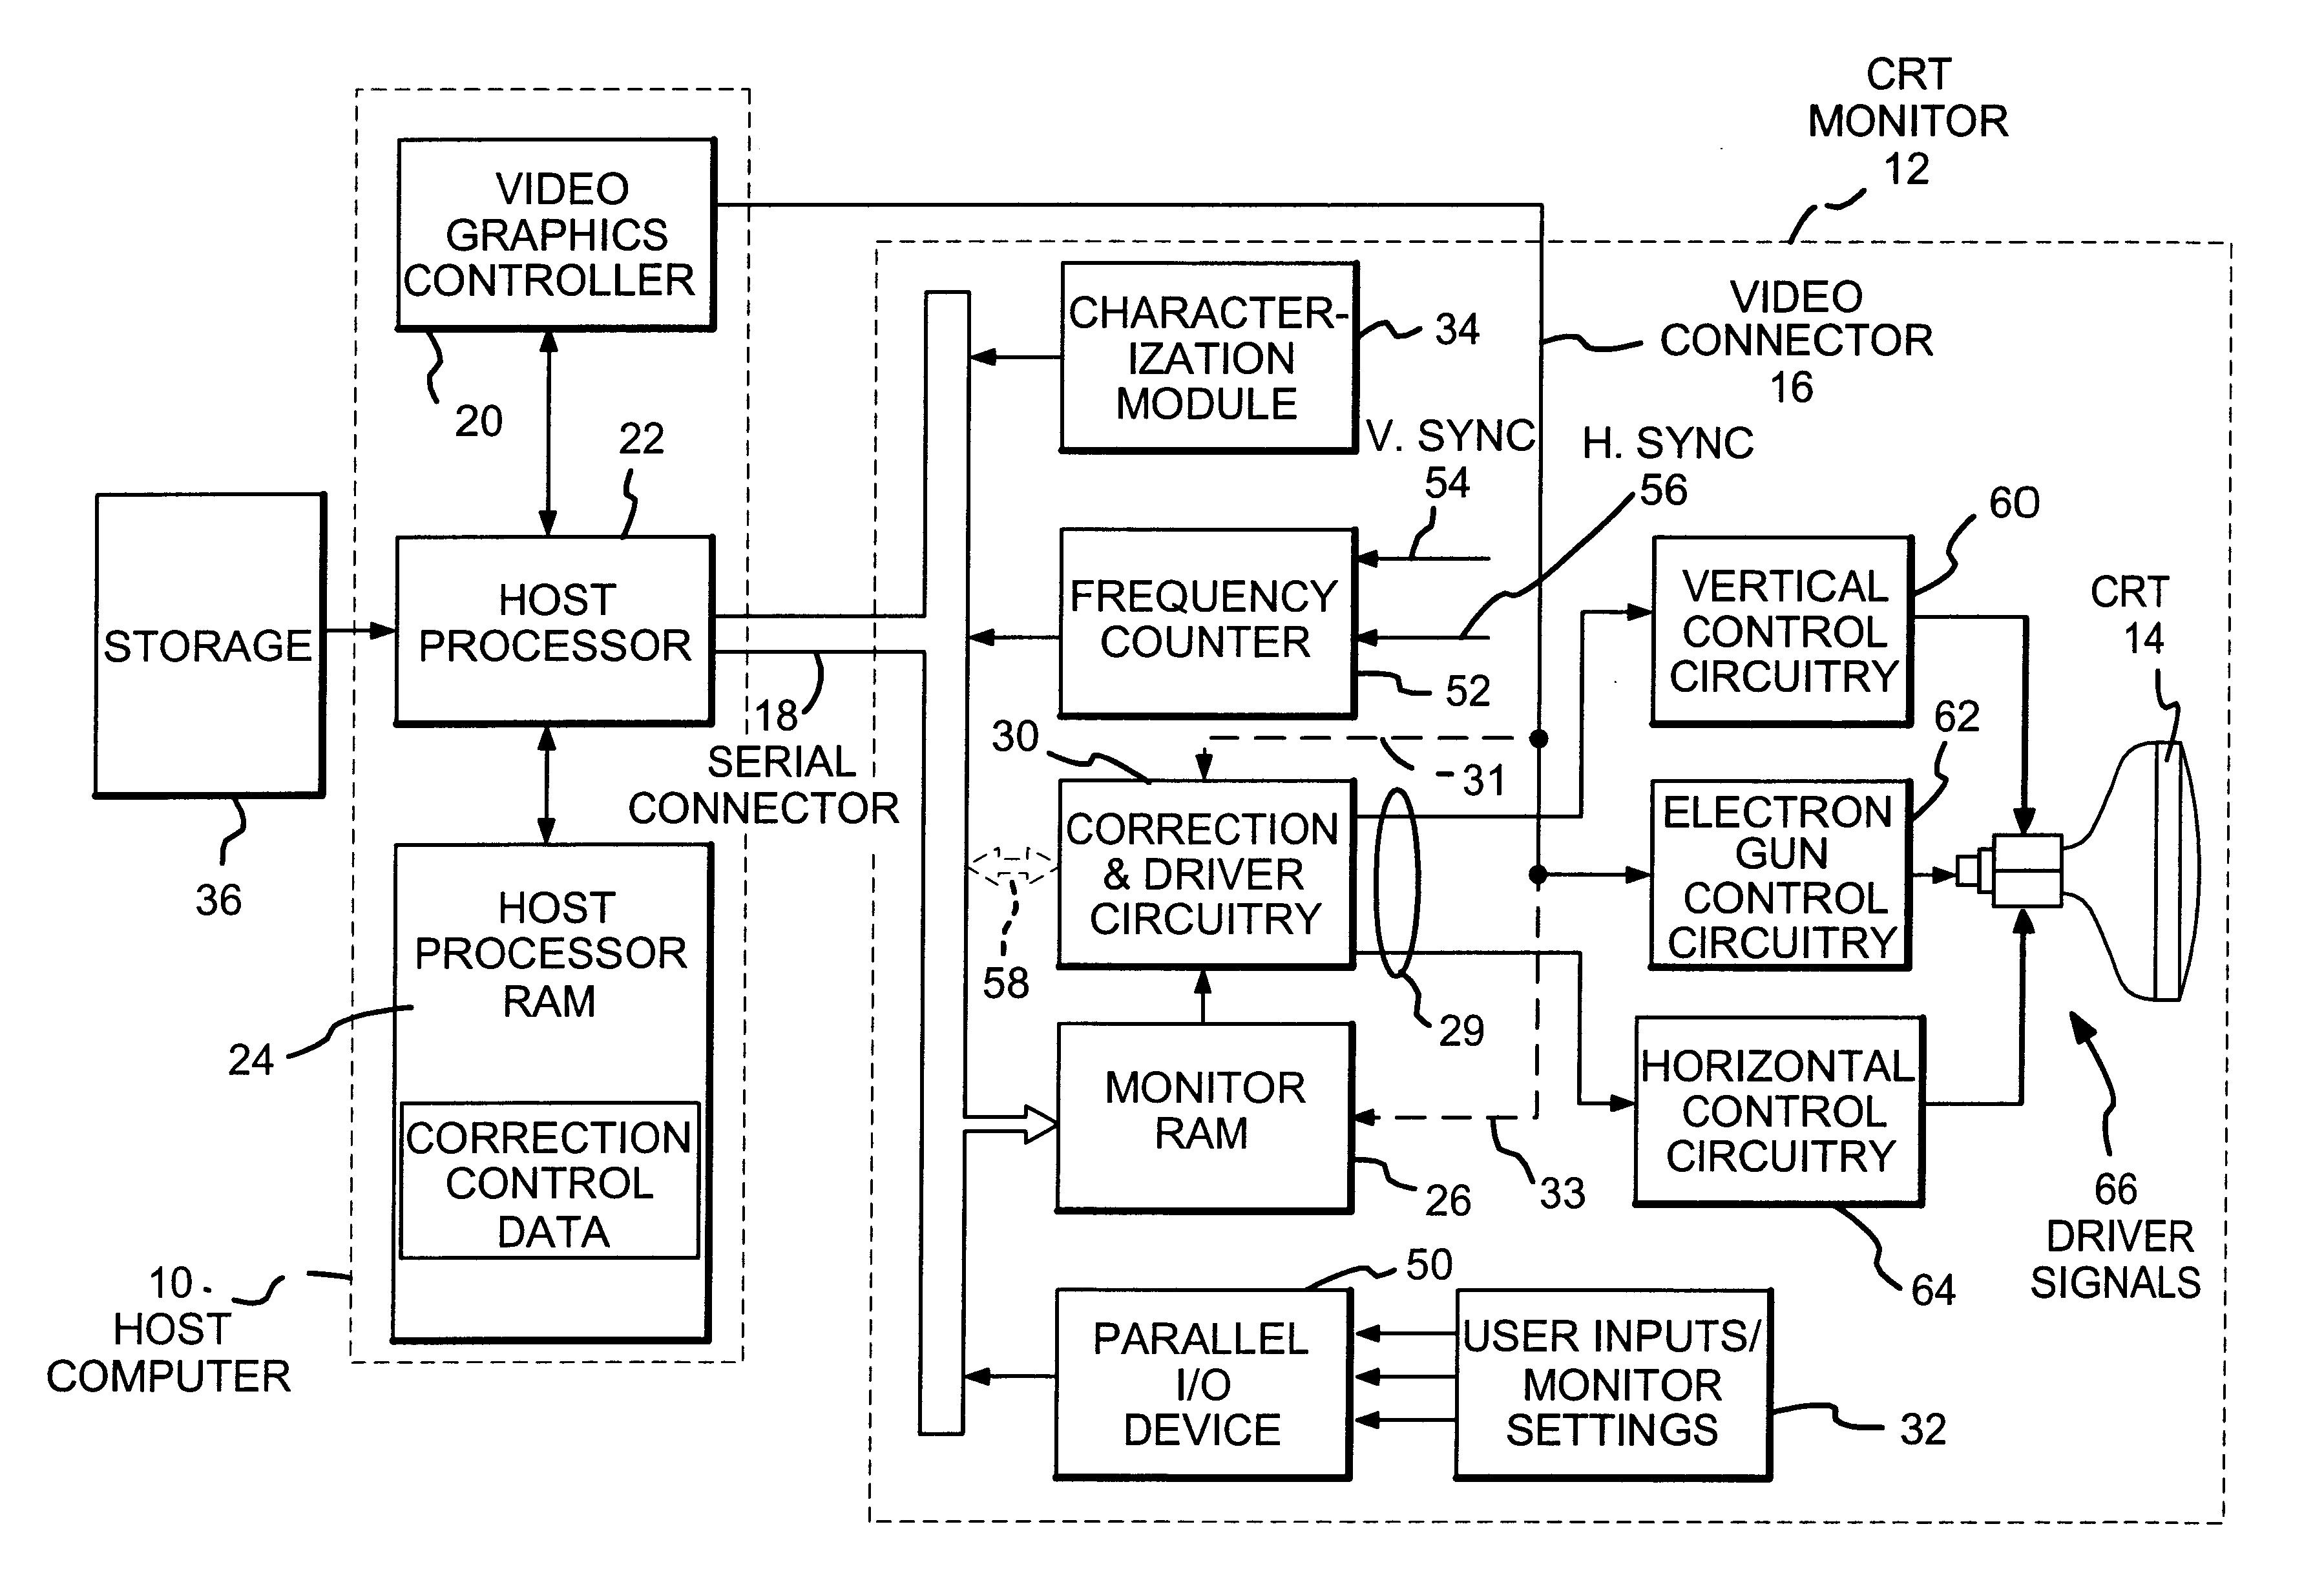 crt wiring diagram wiring diagram centre crt monitor wiring diagram component crt block diagram g6 electronics [ 3597 x 2438 Pixel ]